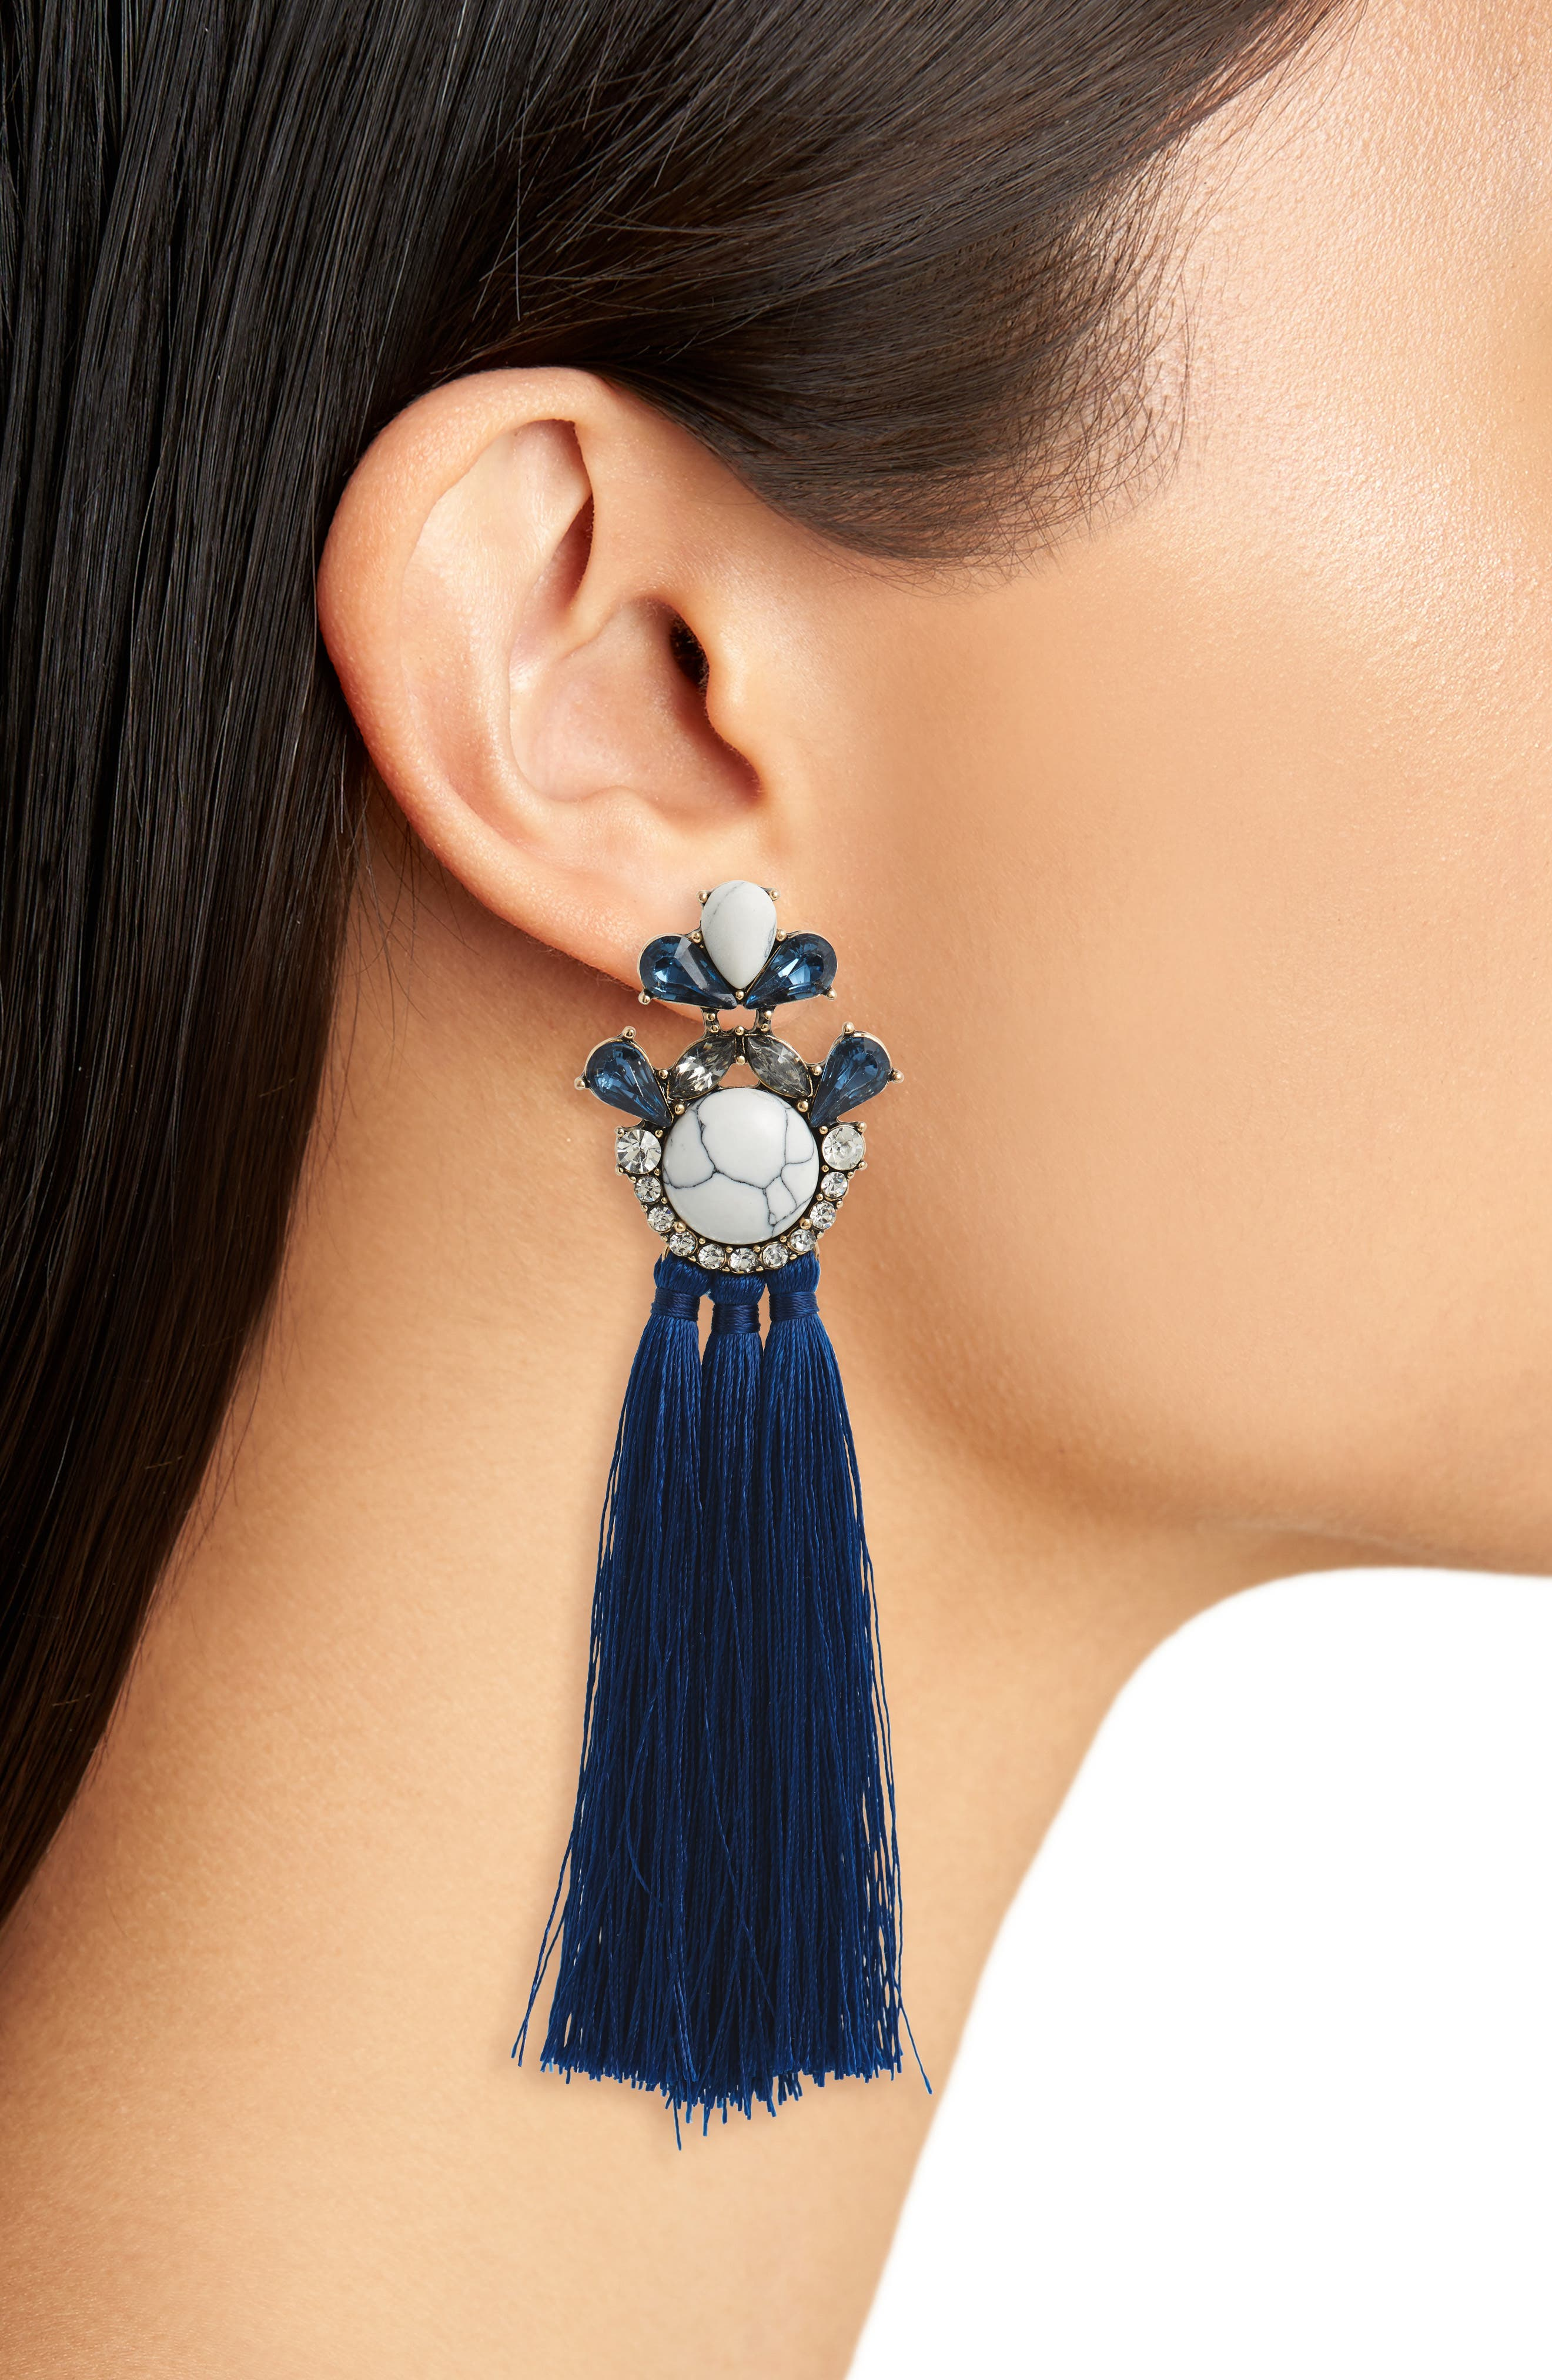 Marble & Crystal Tassel Earrings,                             Alternate thumbnail 2, color,                             Marble/ Blue/ Crystal